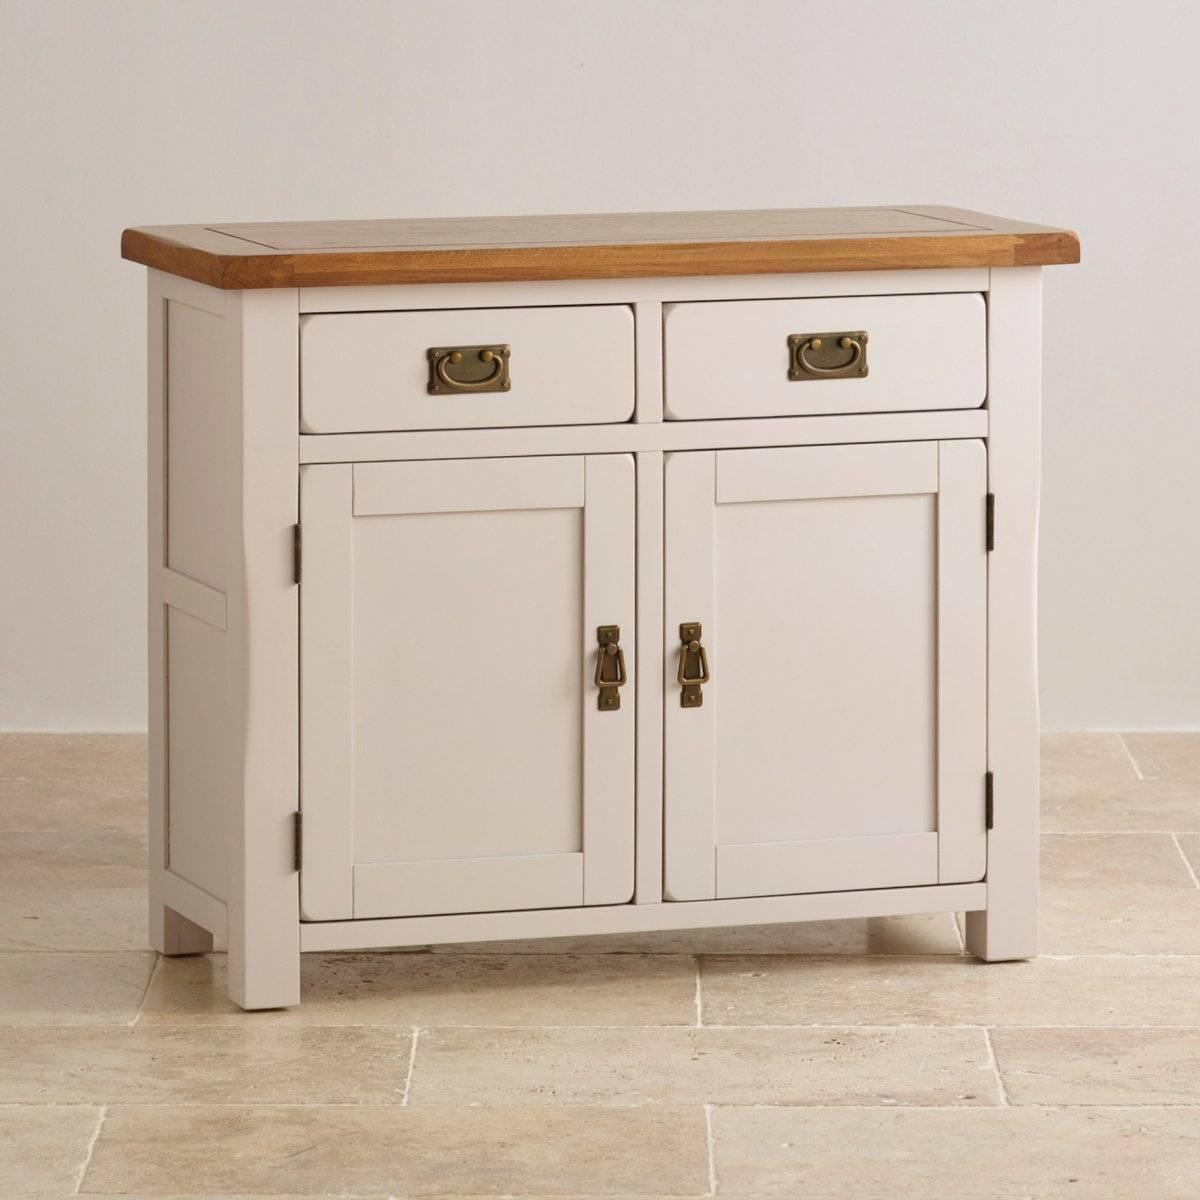 Sideboards   100% Solid Hardwood   Oak Furniture Land Regarding Light Oak Sideboards (View 19 of 20)